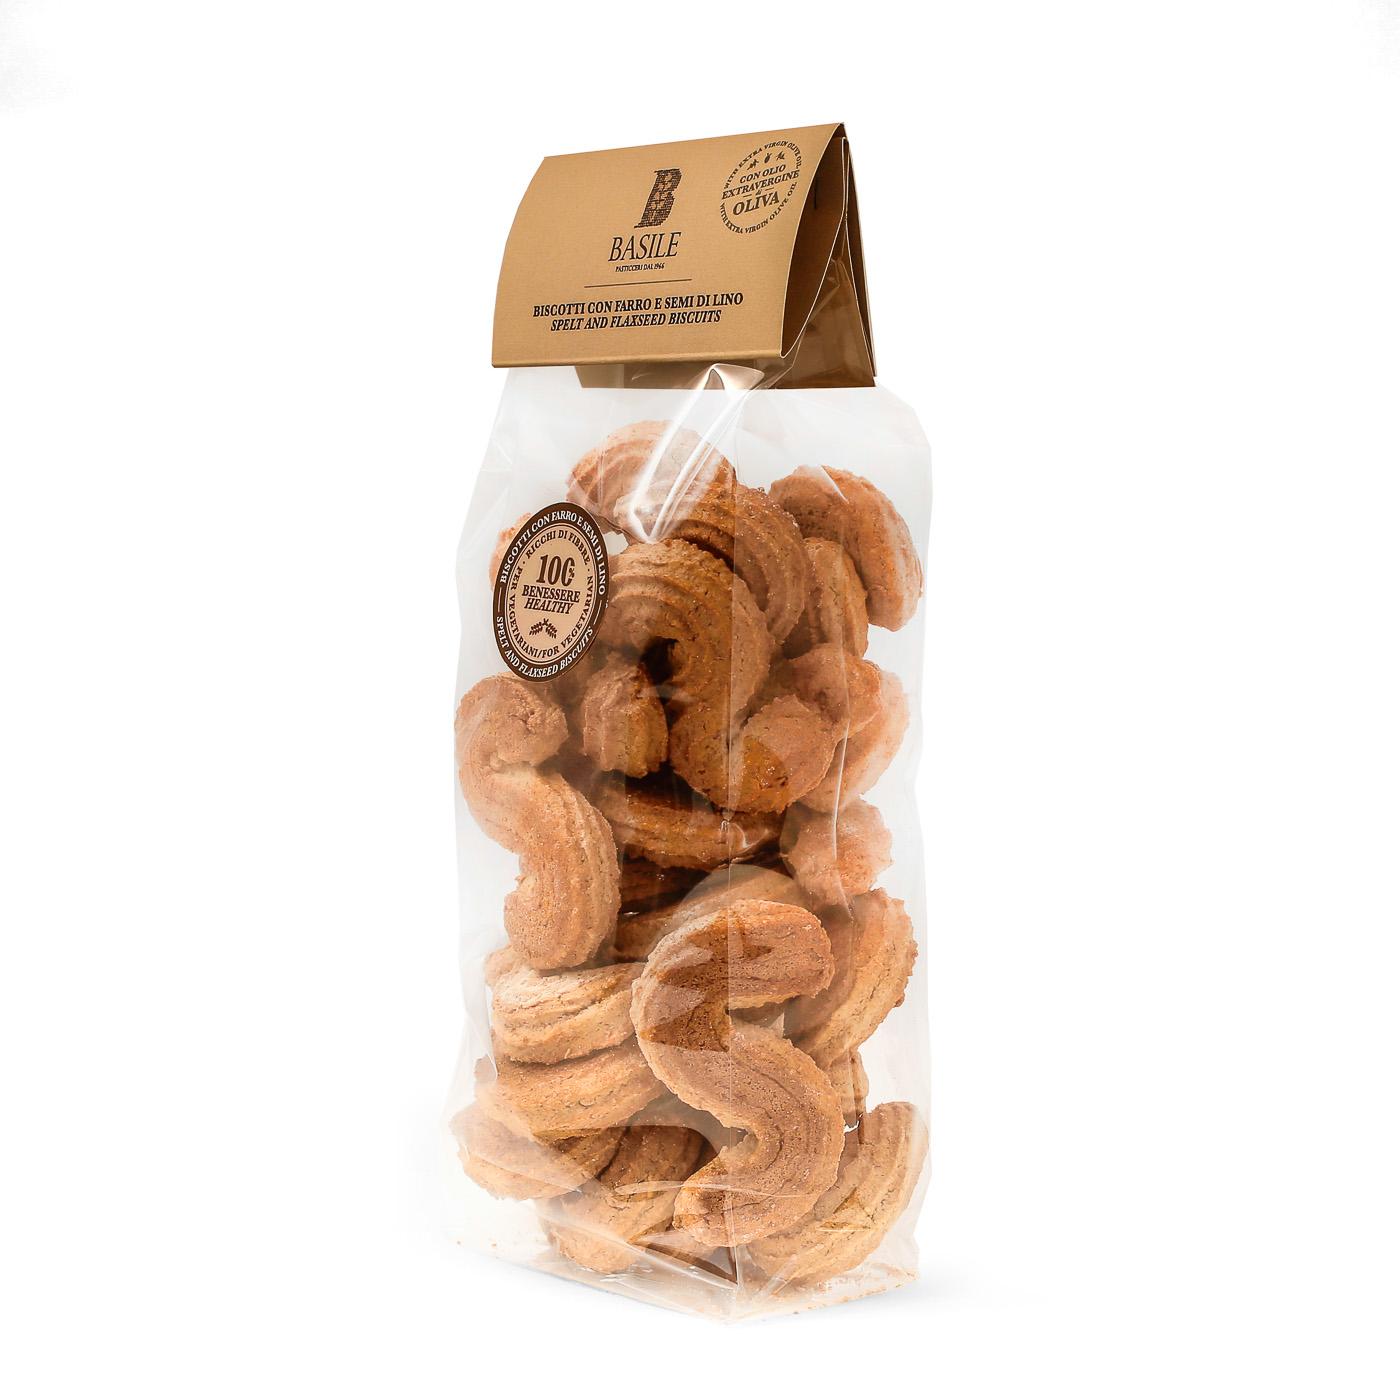 https://www.ragusanews.com//immagini_articoli/14-05-2015/1431626575-2-i-biscotti-integrali-artigianali-di-basile-pasticceri.jpg